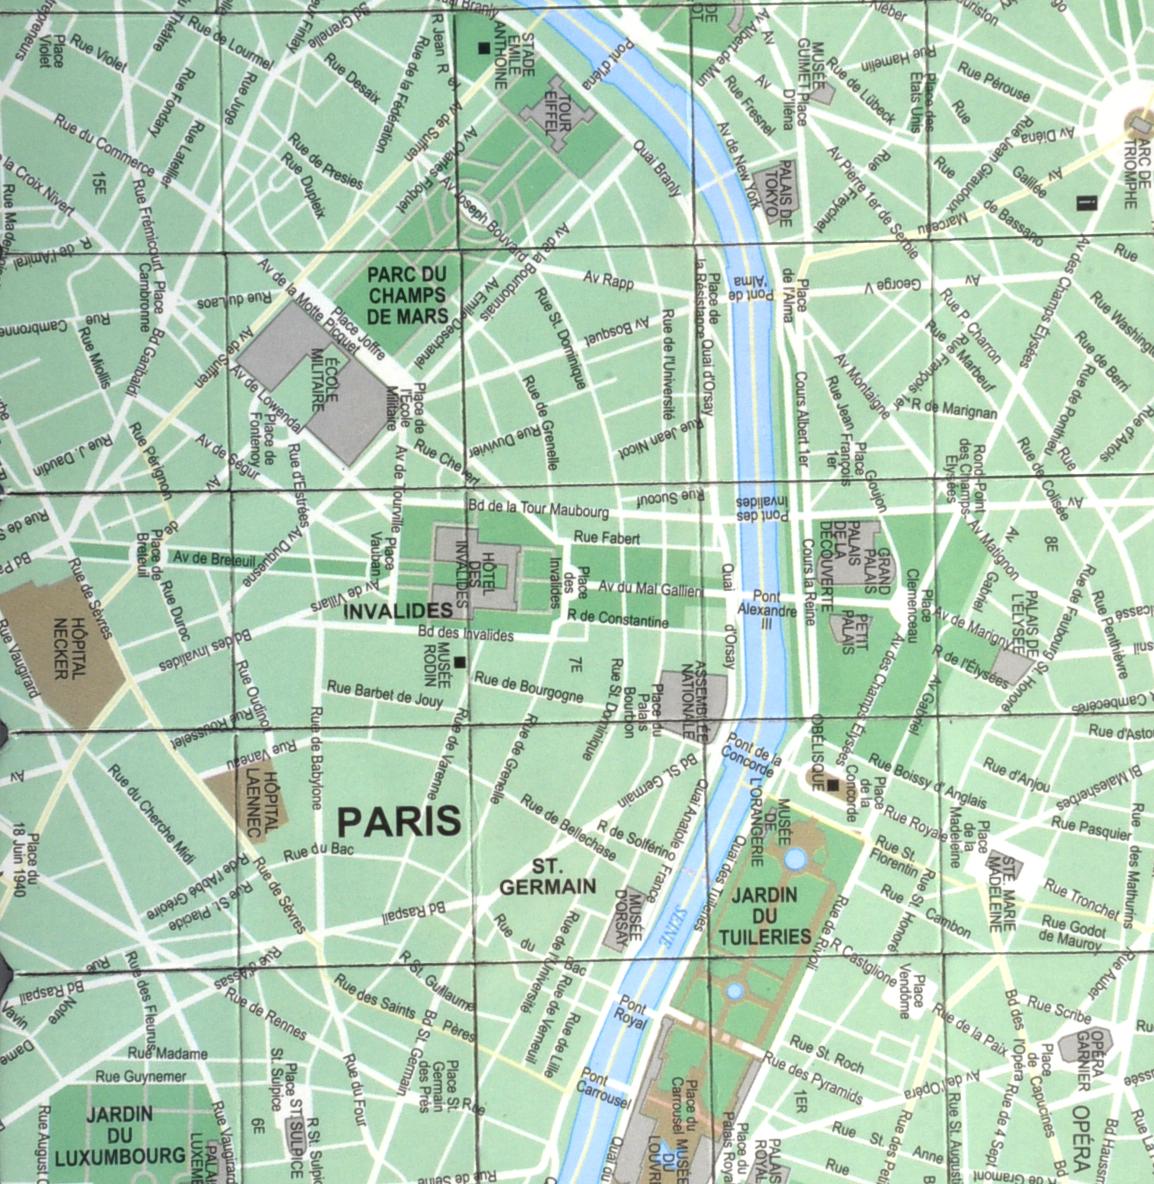 Paris City Map Fridge Magnet Puzzle - Learn the City Map Knowledge with  Fridge Magnets